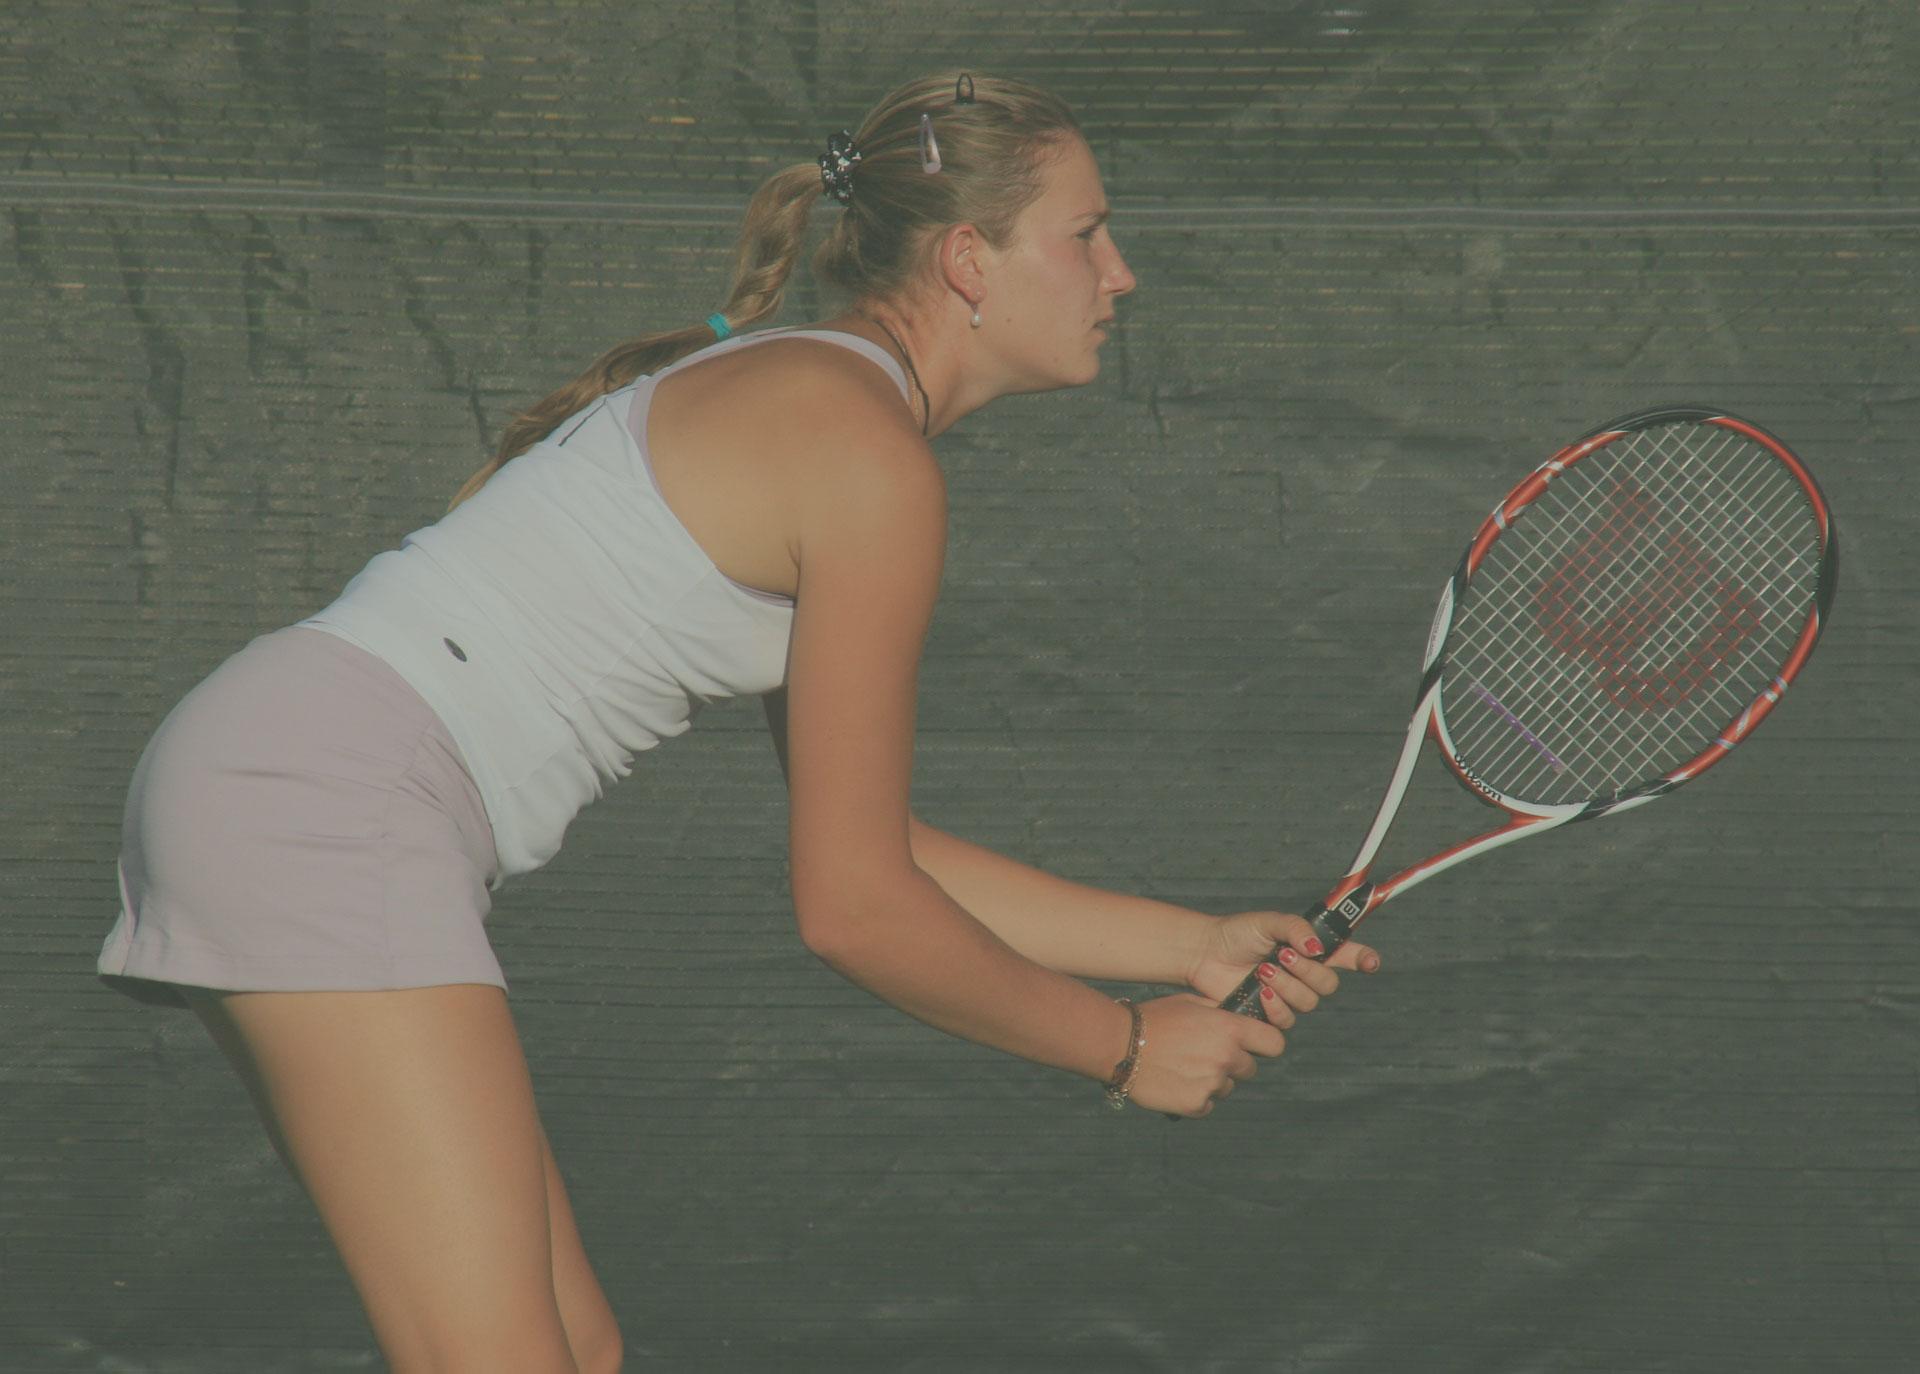 tennis-player-703785